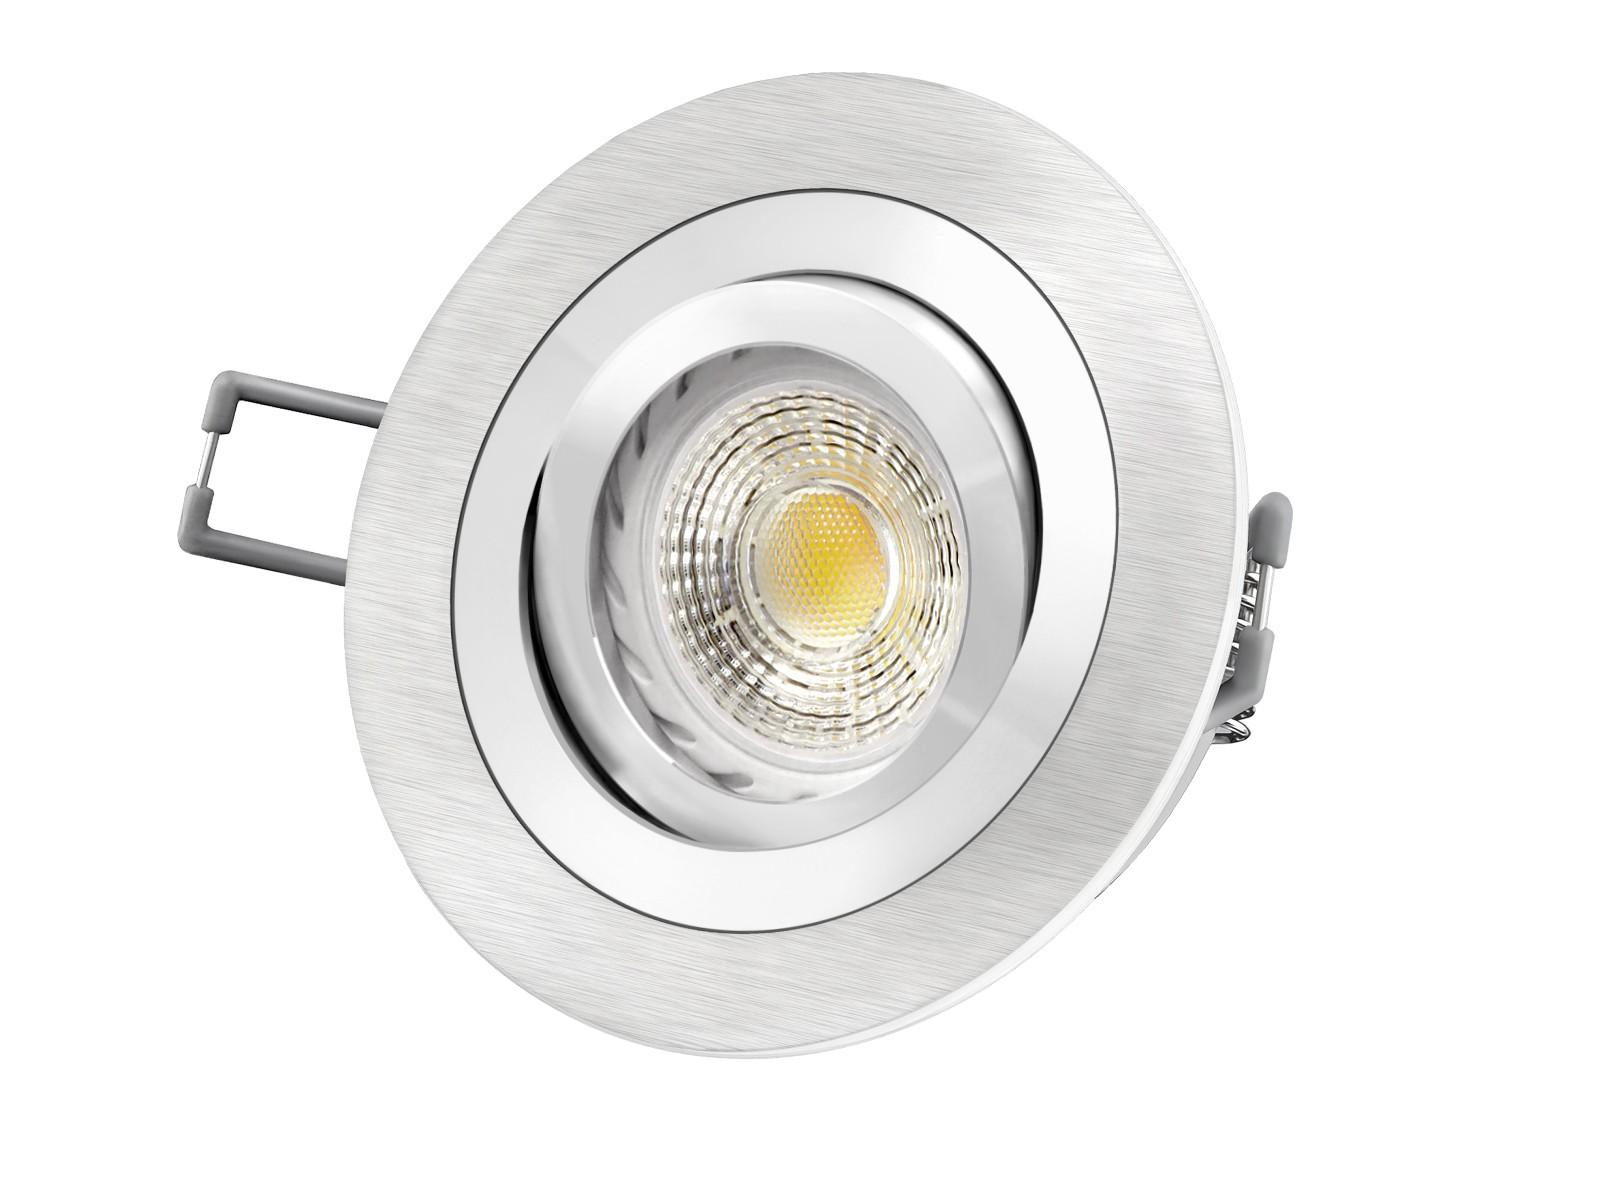 Rf 2 aluminium led einbaustrahler leuchte rund 3 5w smd for Led leuchte rund